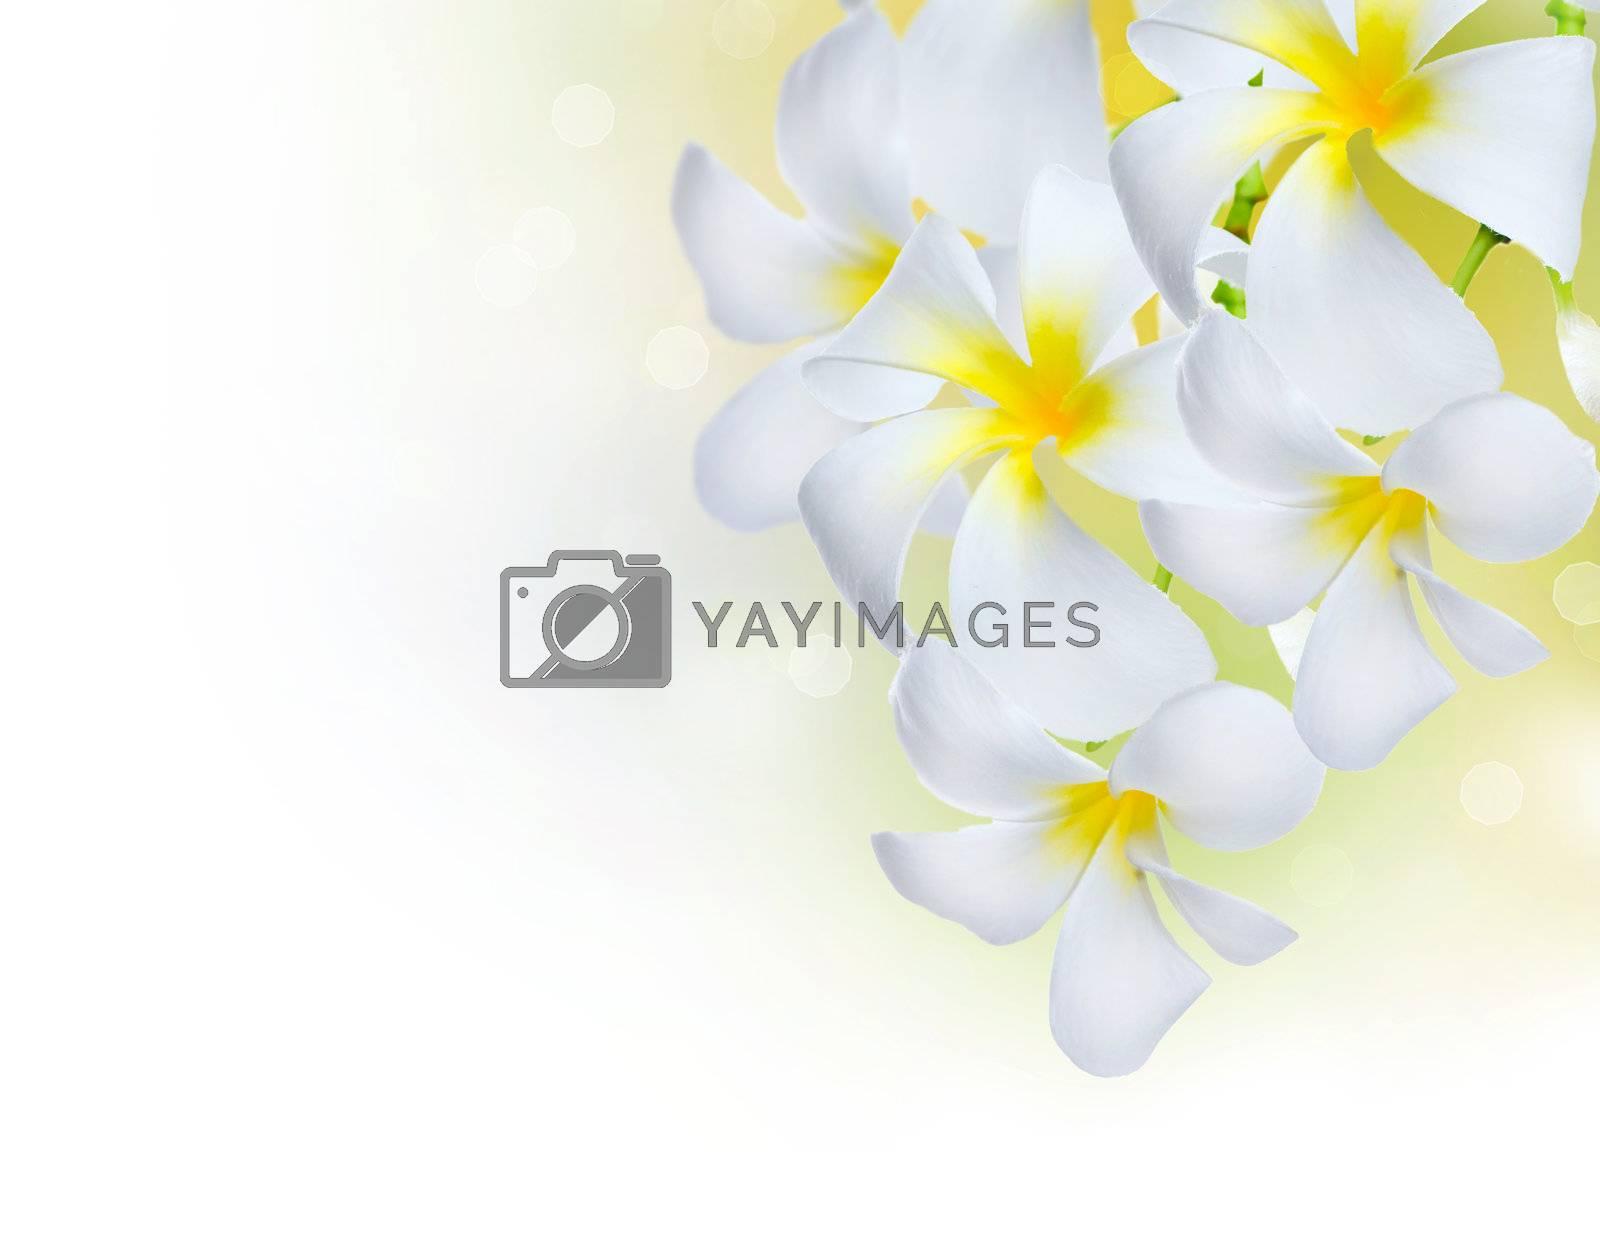 Frangipani Spa Flowers border.Plumeria by Subbotina Anna